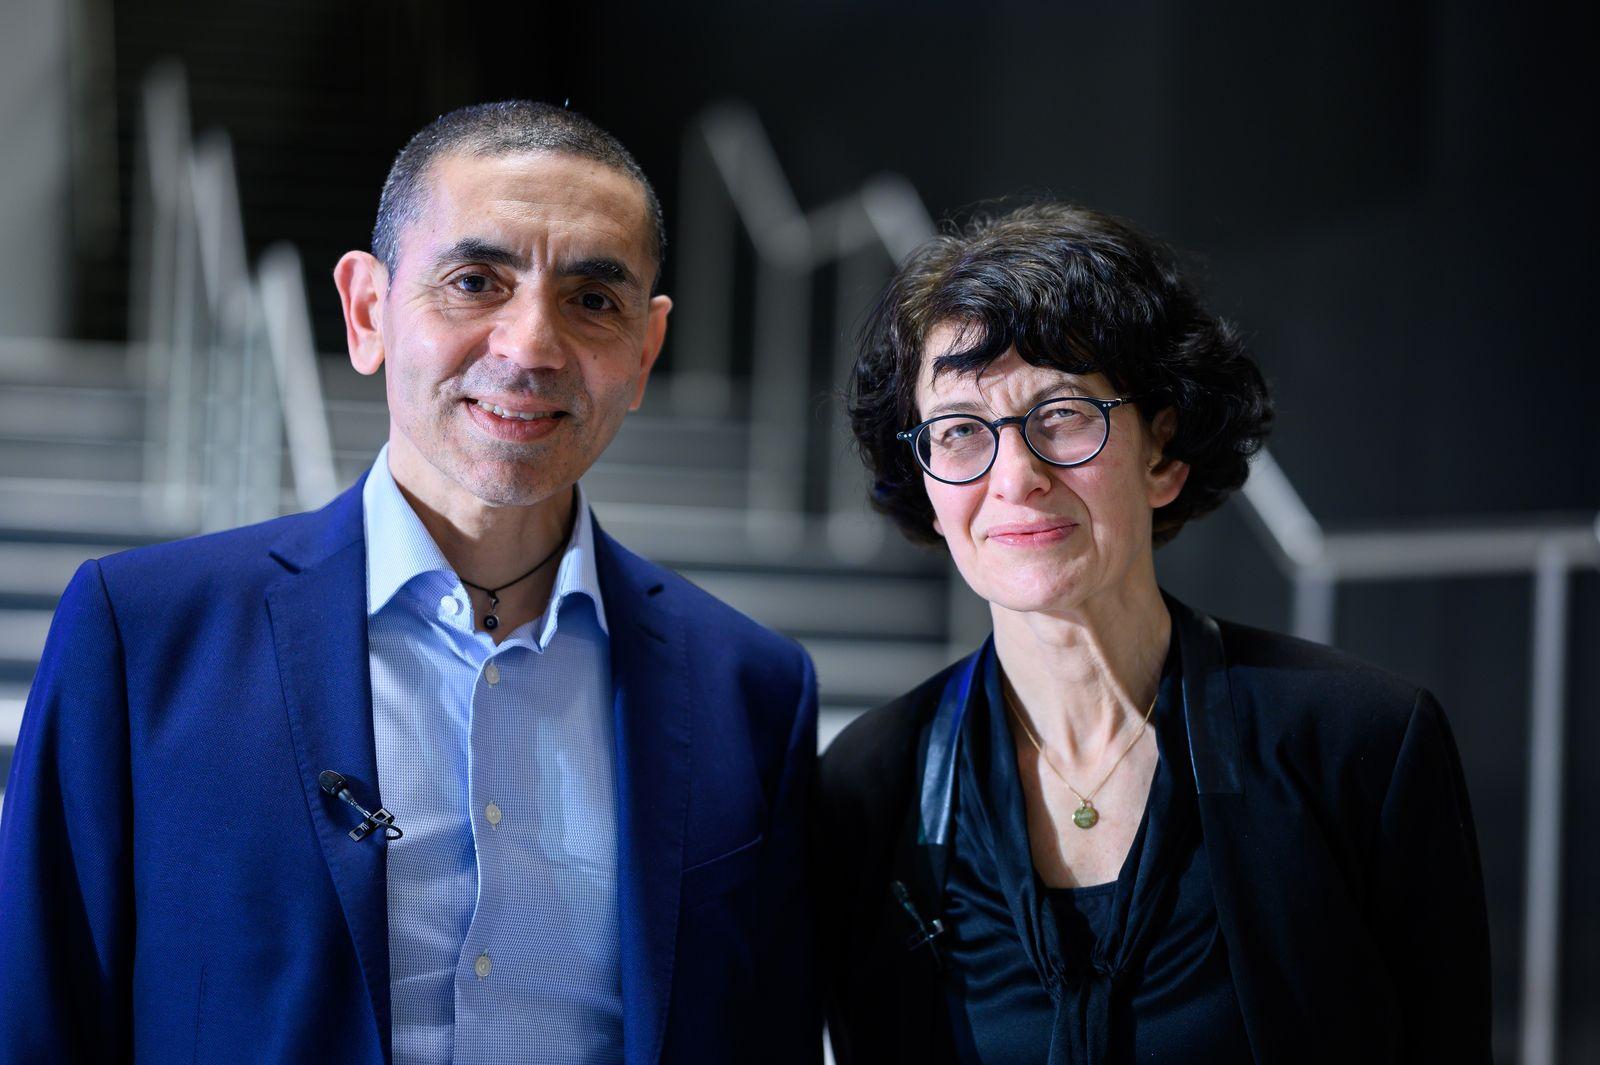 Springer Award Goes To BioNTech Founders Özlem Türeci And Ugur Sahin